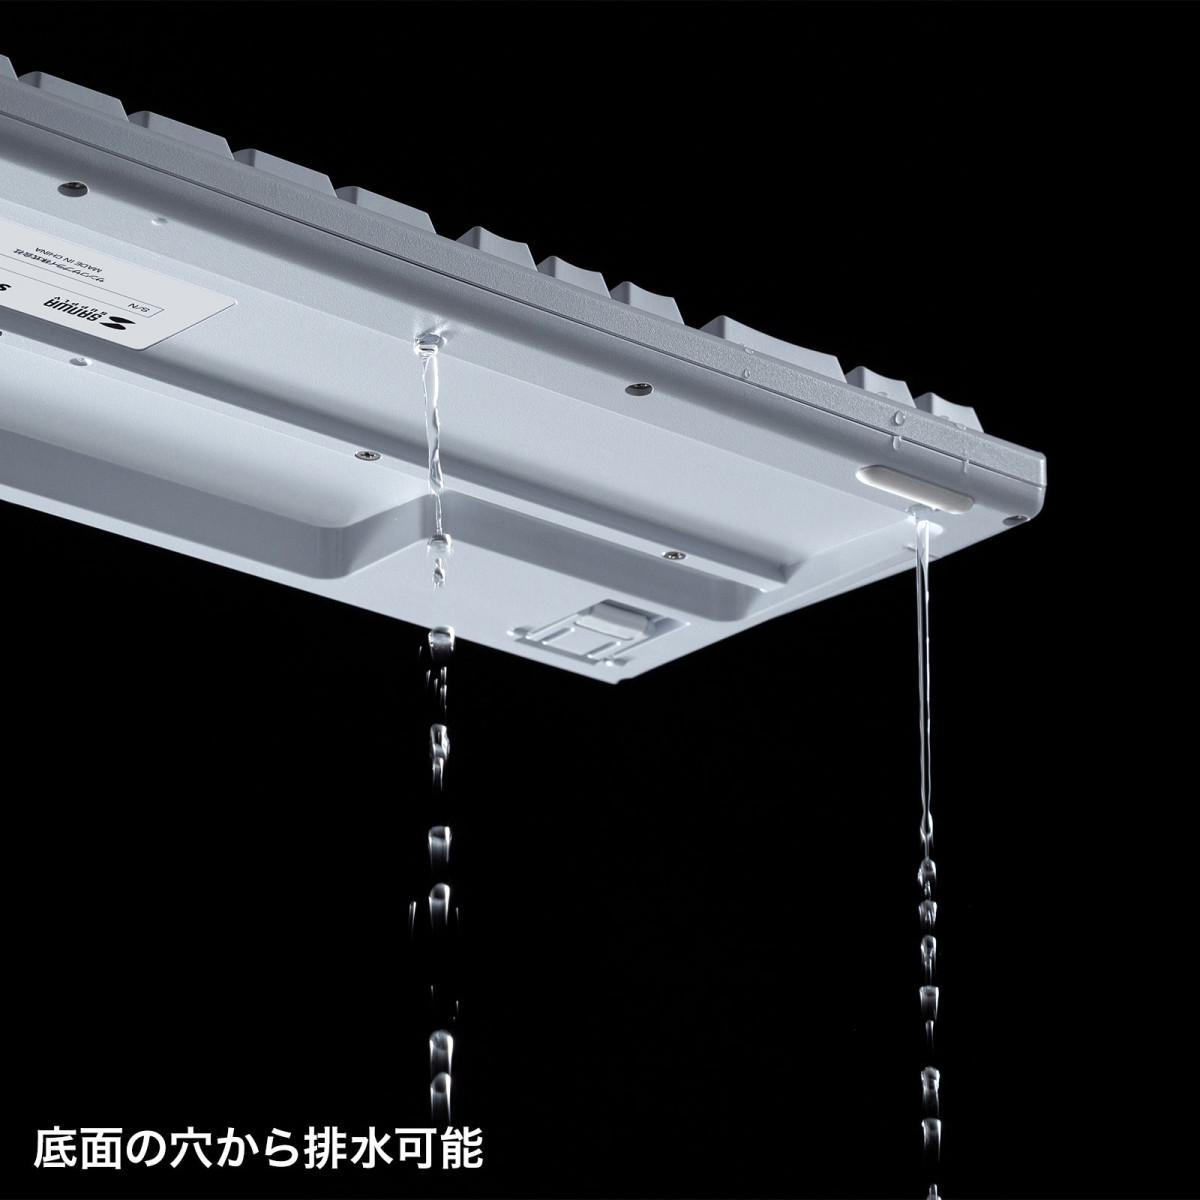 [SKB-BS6W] 日本語109キーボード 抗菌防水防塵タイプ ホワイト